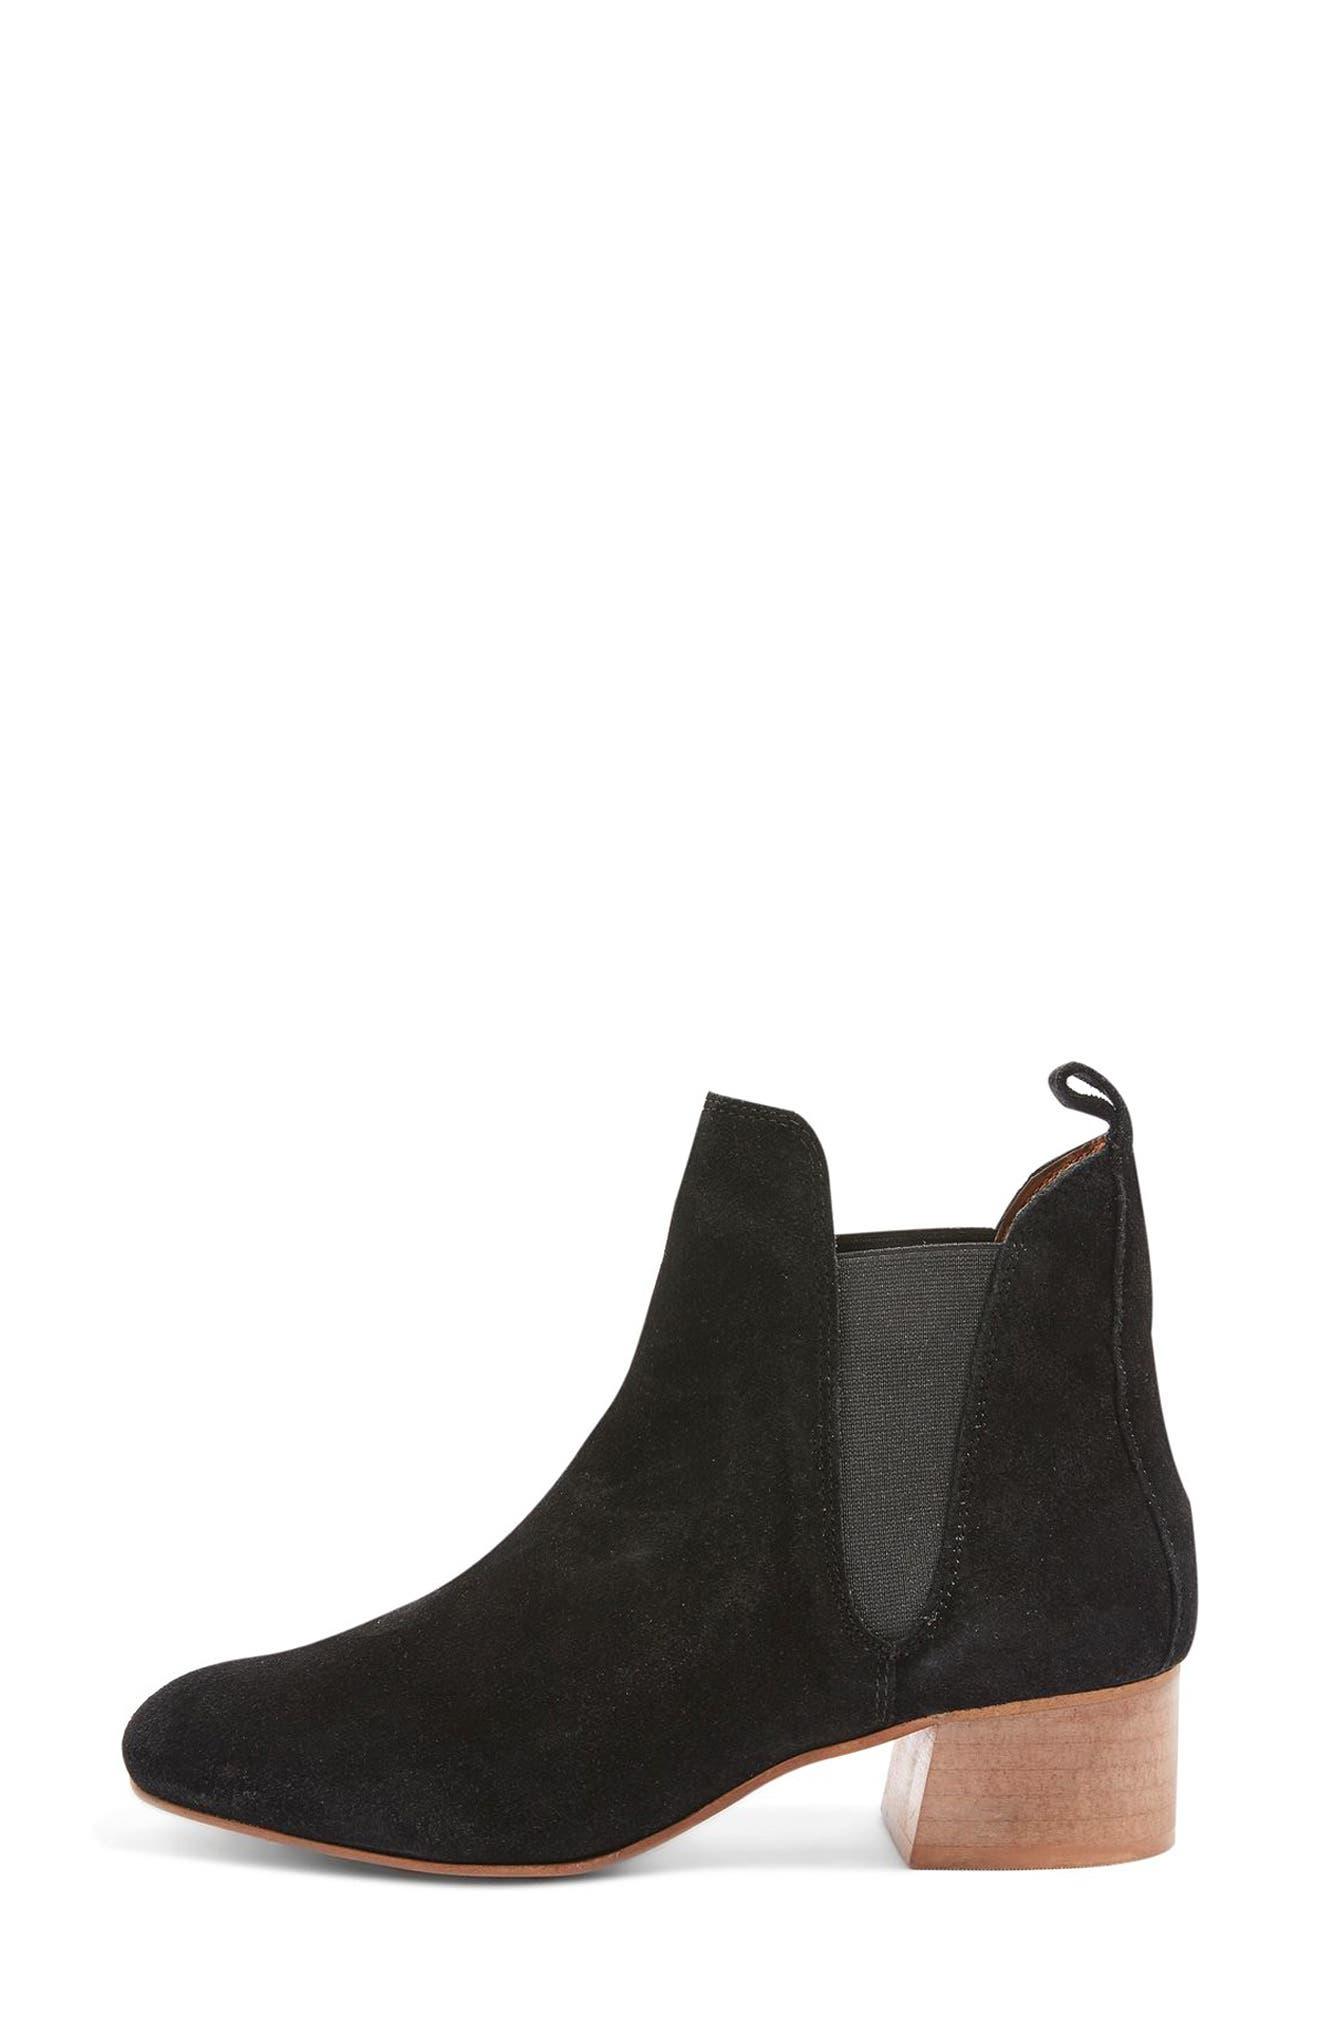 Barley Chelsea Boot,                             Alternate thumbnail 2, color,                             Black